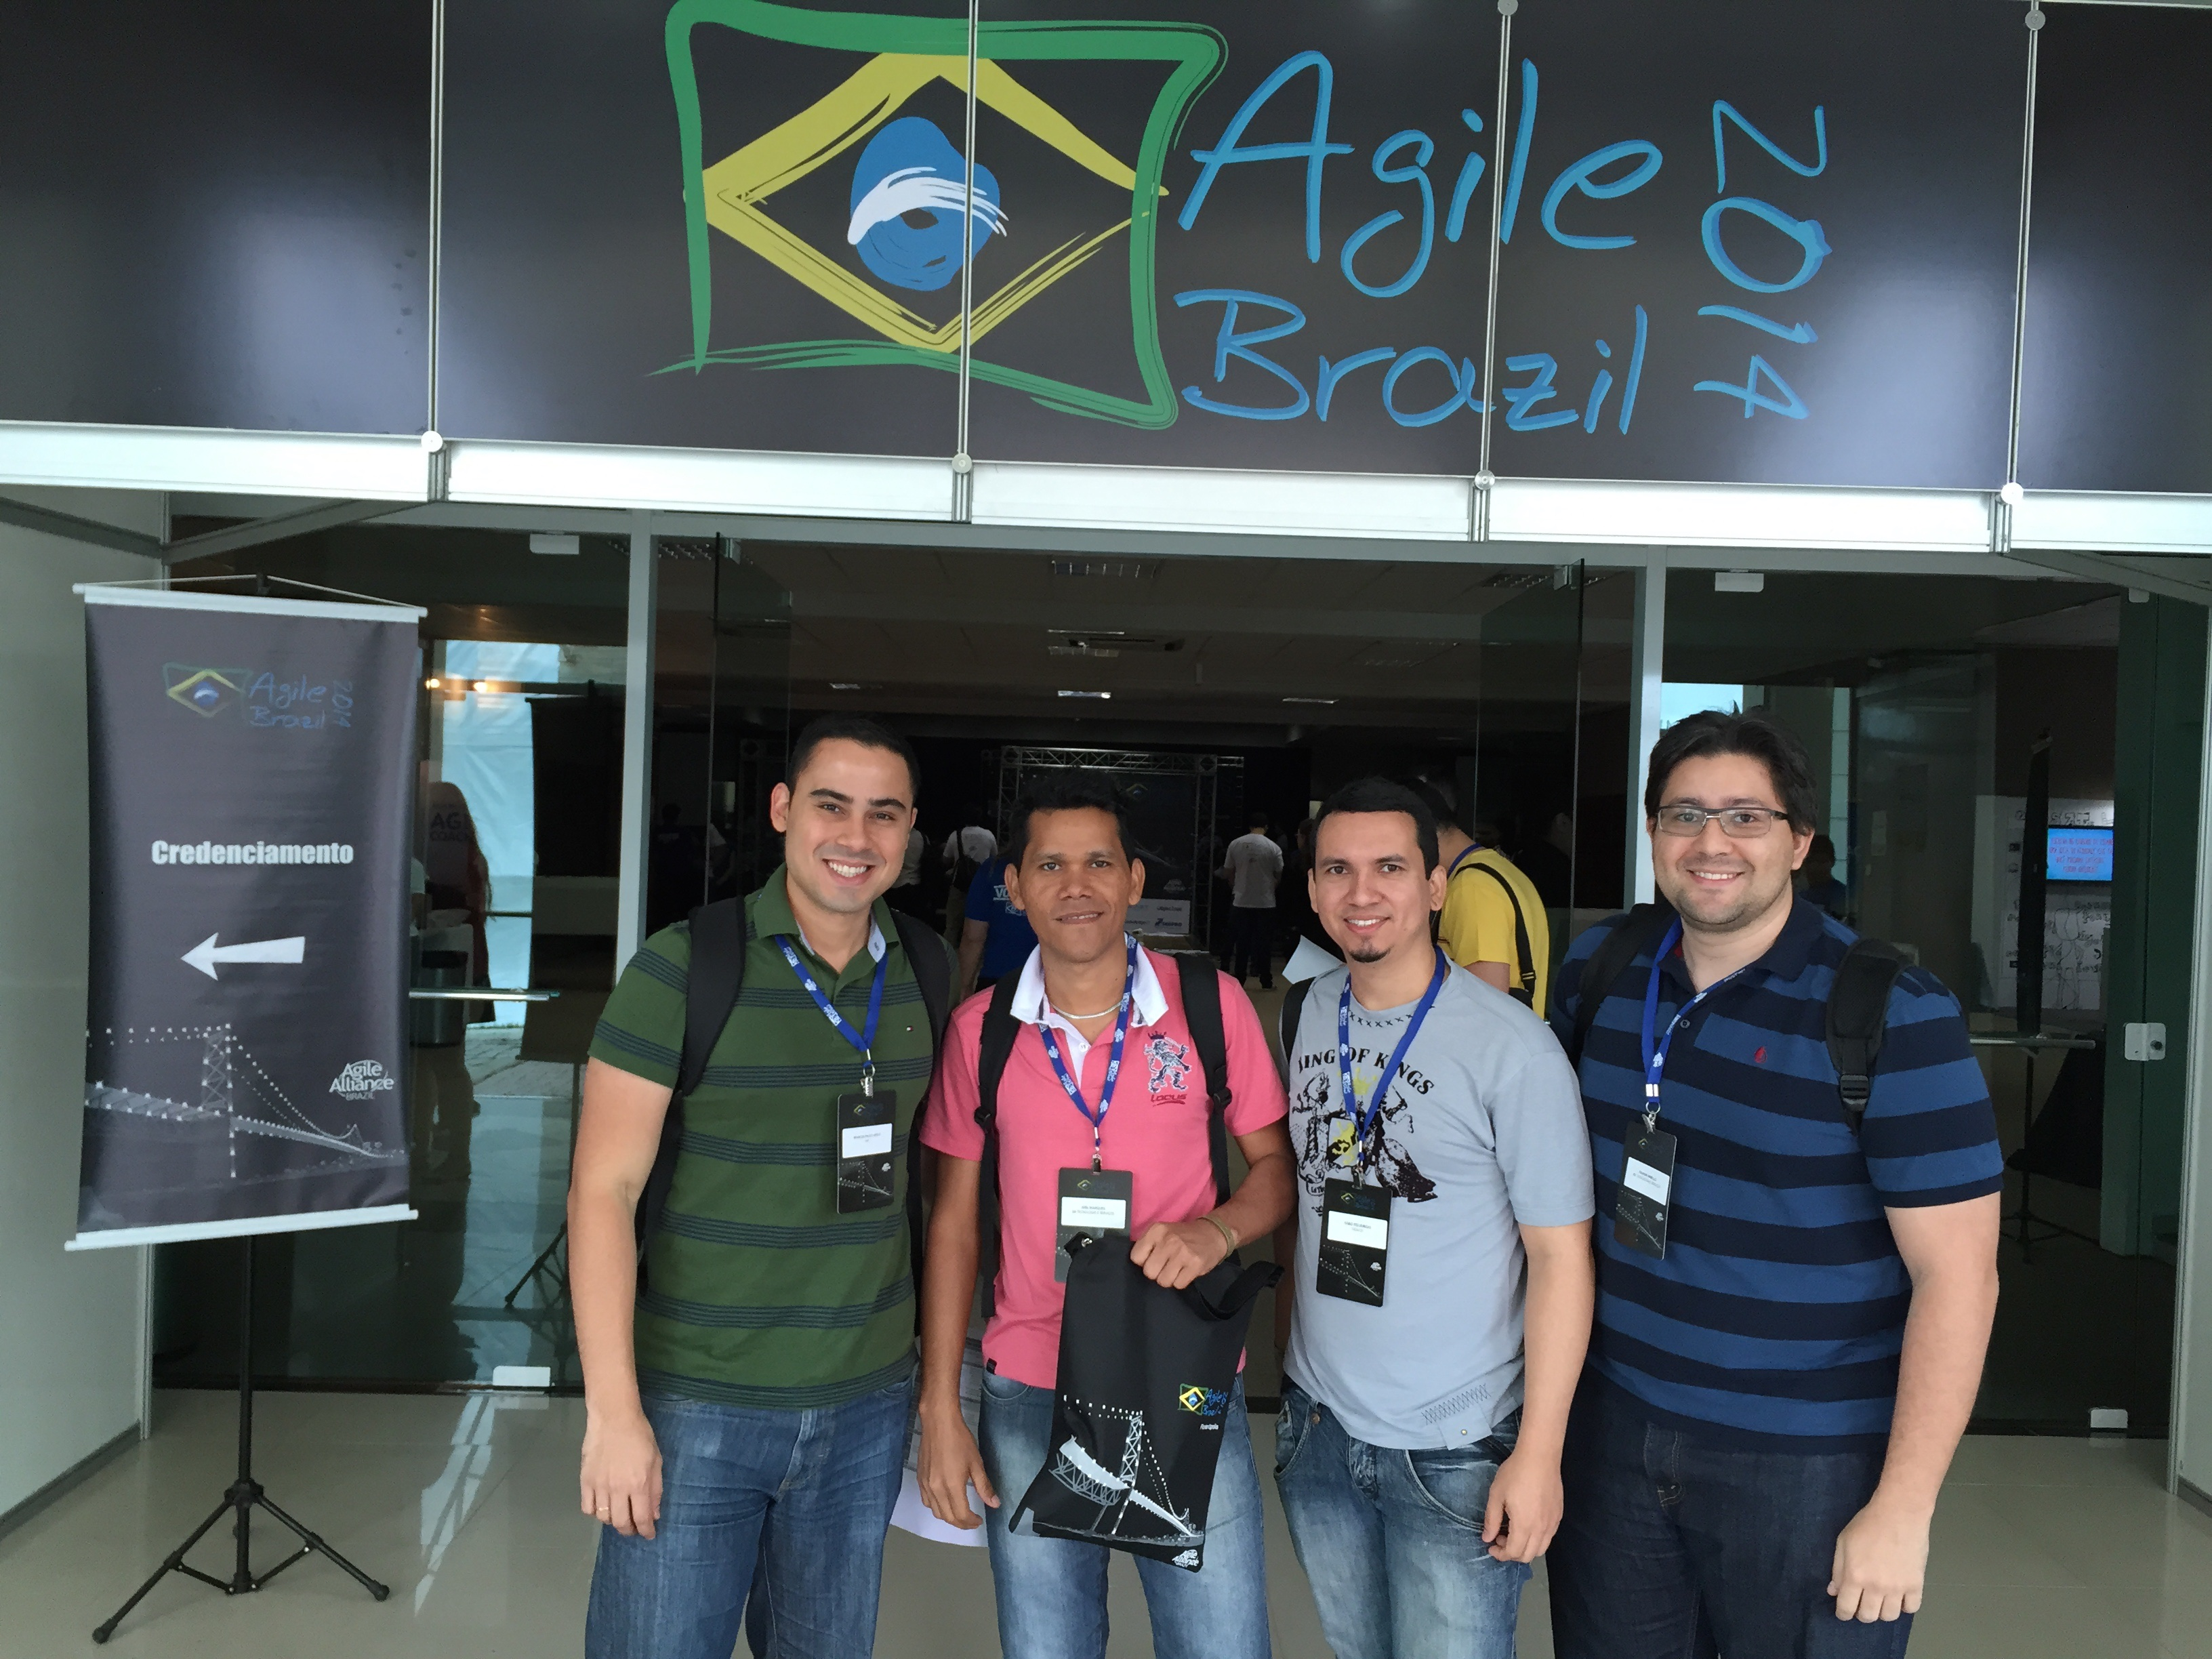 Florianópolis_Agile_Brazil_Nov_2014_ 019